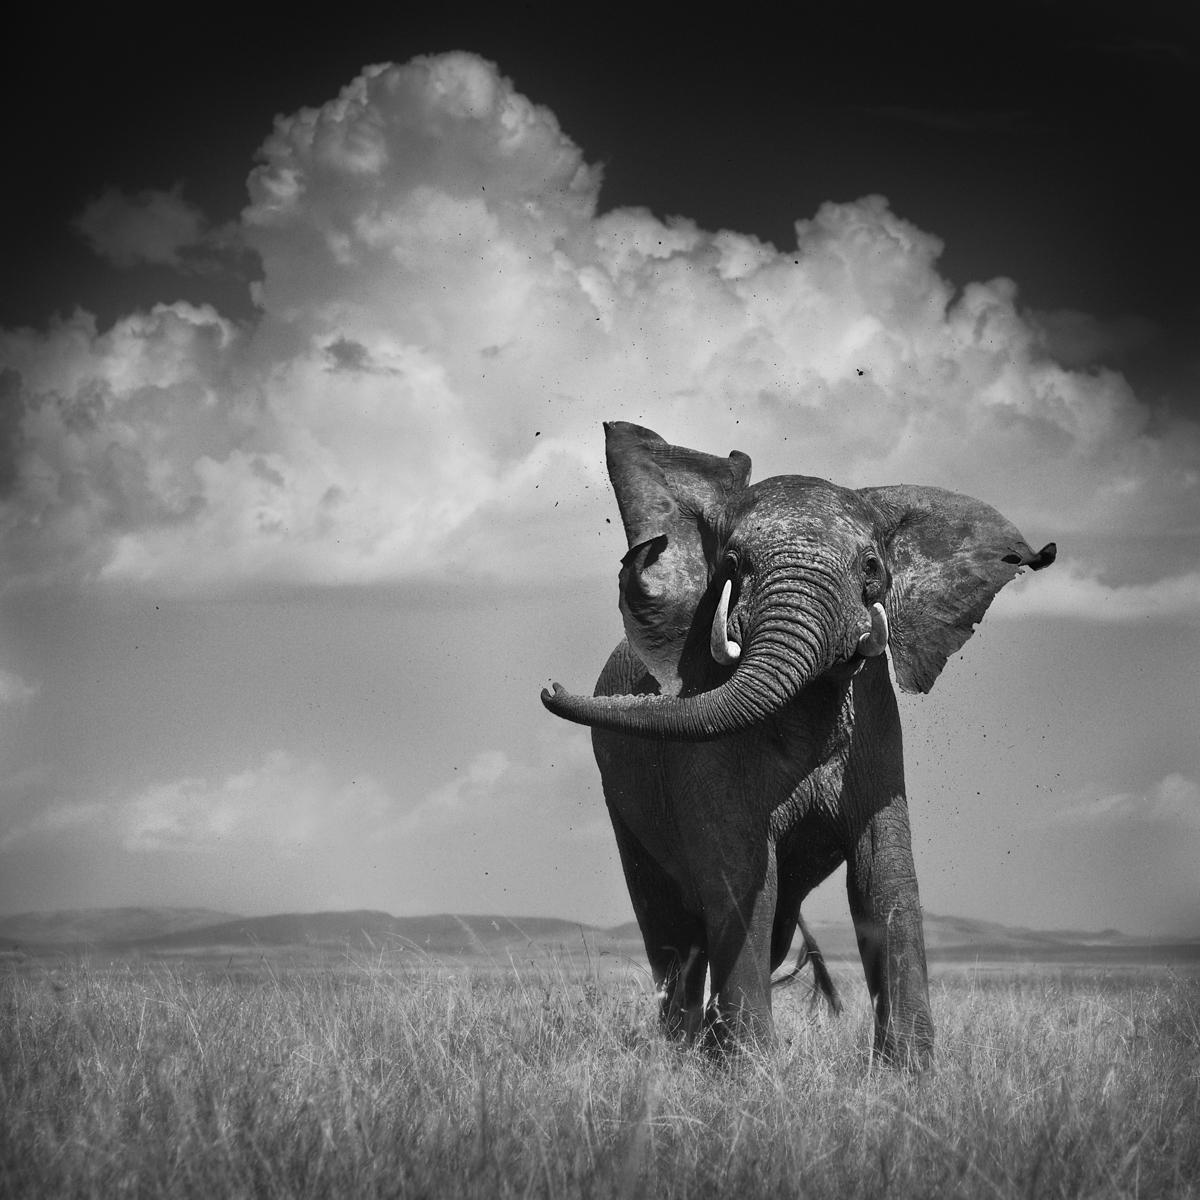 Elephant Throwing Dirt - Maasai Mara, Kenya